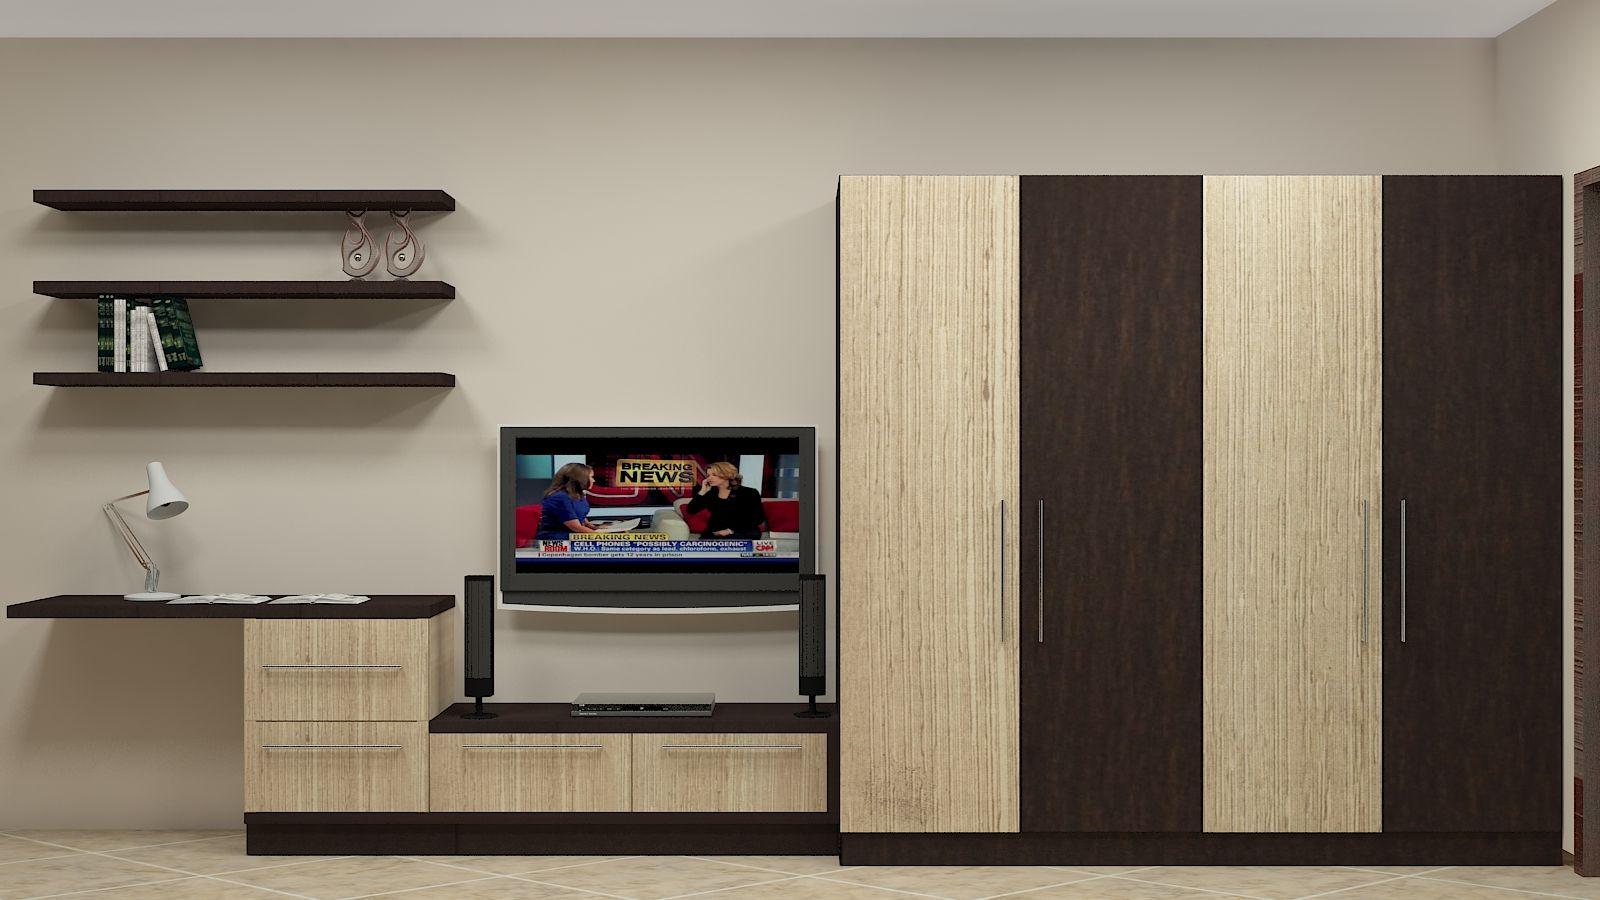 Modular wardrobe design for indian bedroom having 4 door along with tv unit study unit amp wall